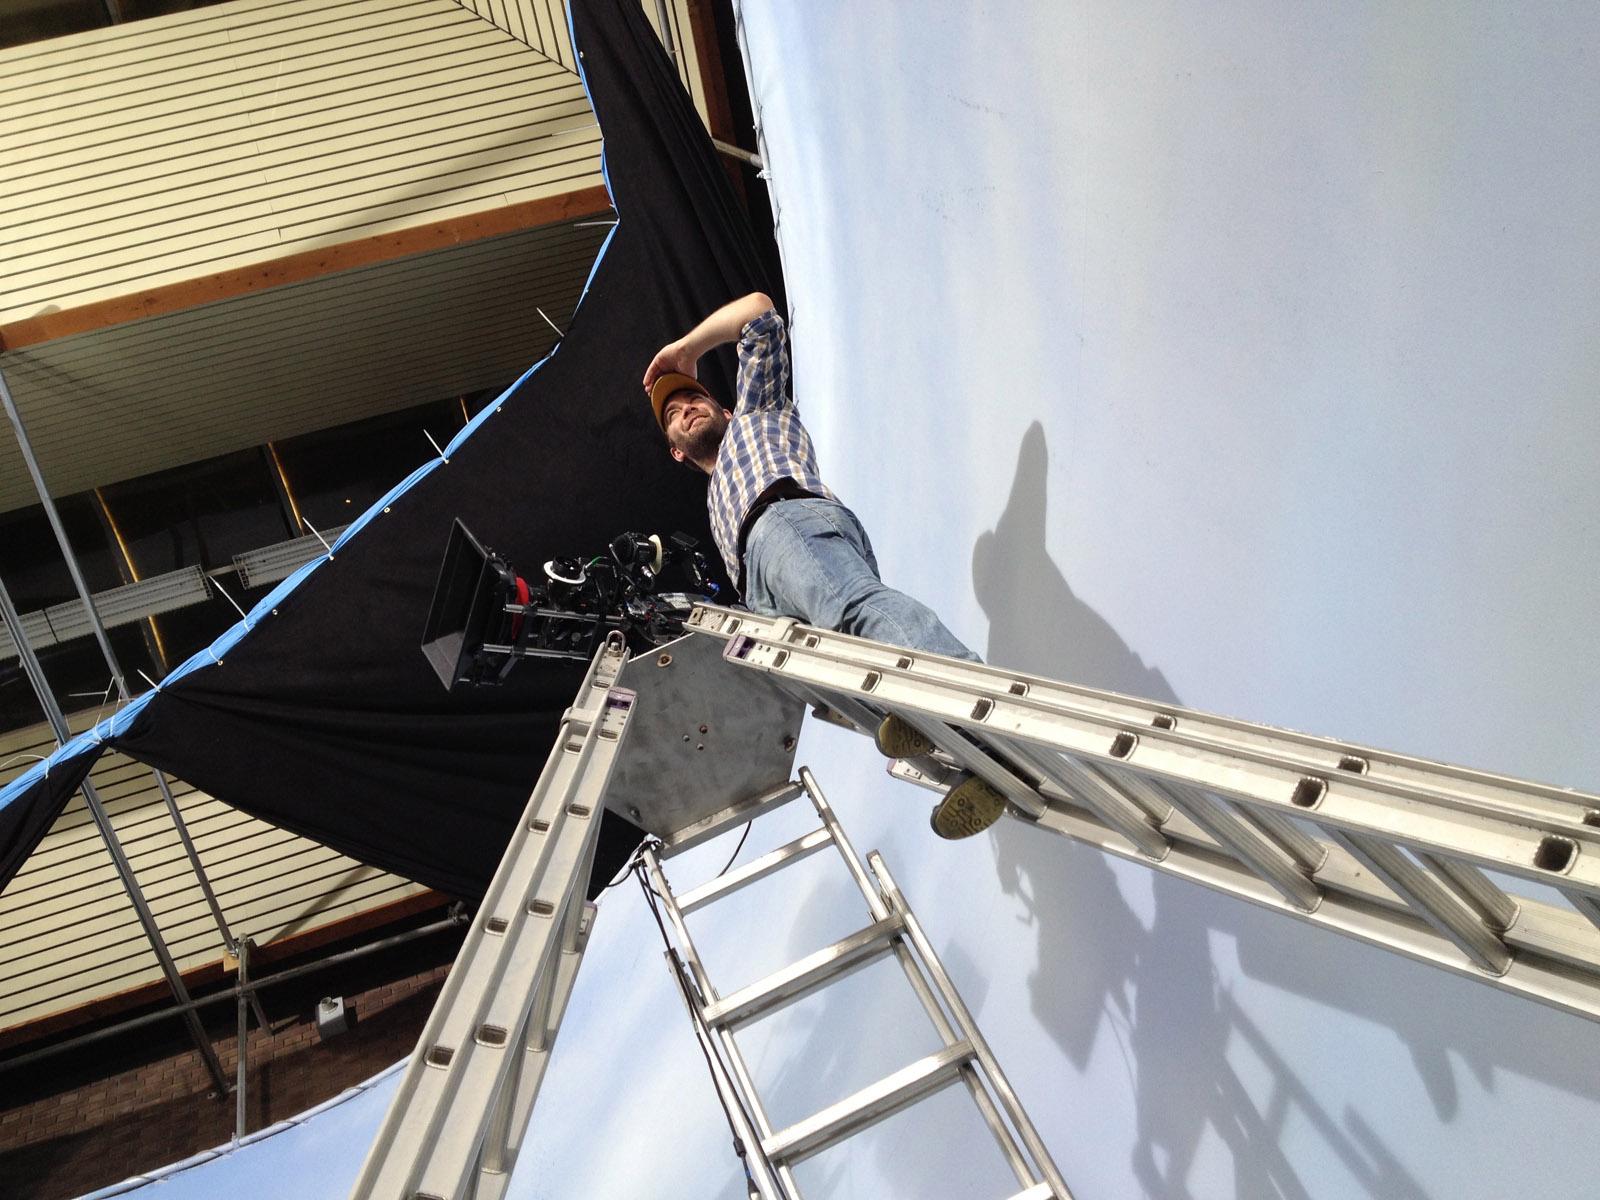 NICK_GILLESPIE_05_HIGH-RISE_Ladder_Pod_(Photo-credit-Lydia_Lewis)